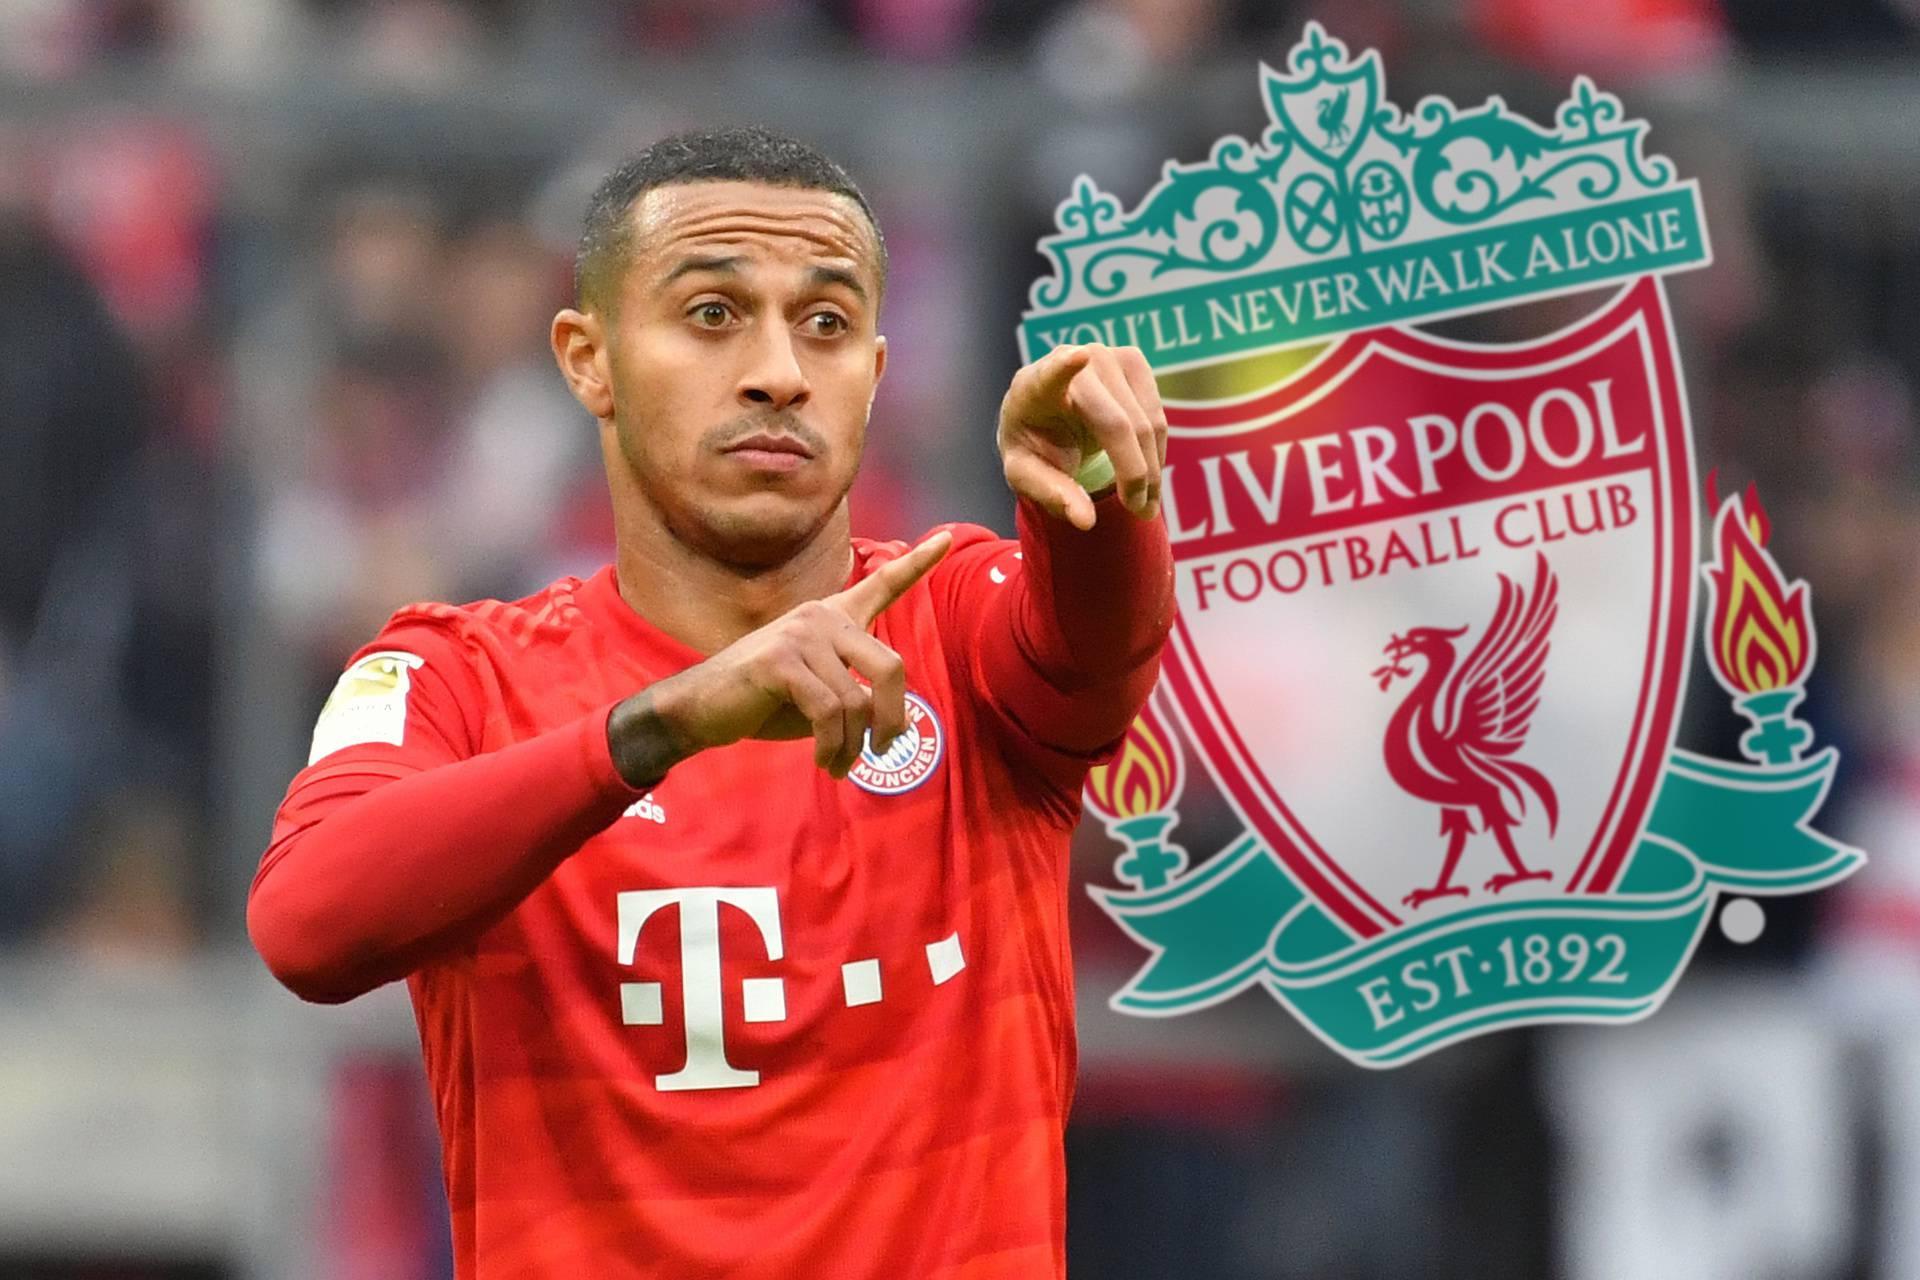 Thiago ALCANTARA (FC Bayern Munich) apparently before moving to Liverpool.